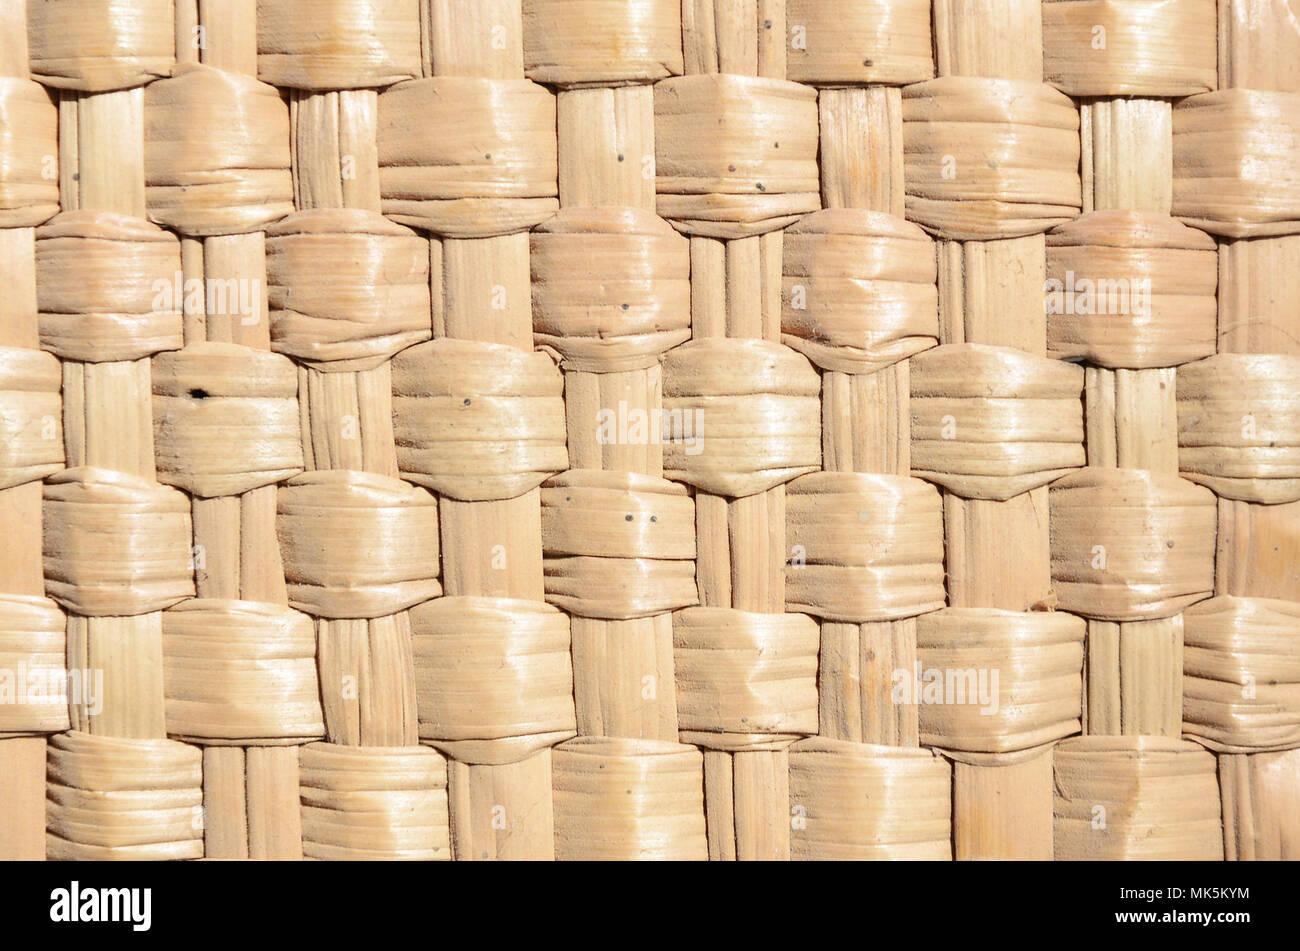 Weaving Mat Material Stock Photos Amp Weaving Mat Material